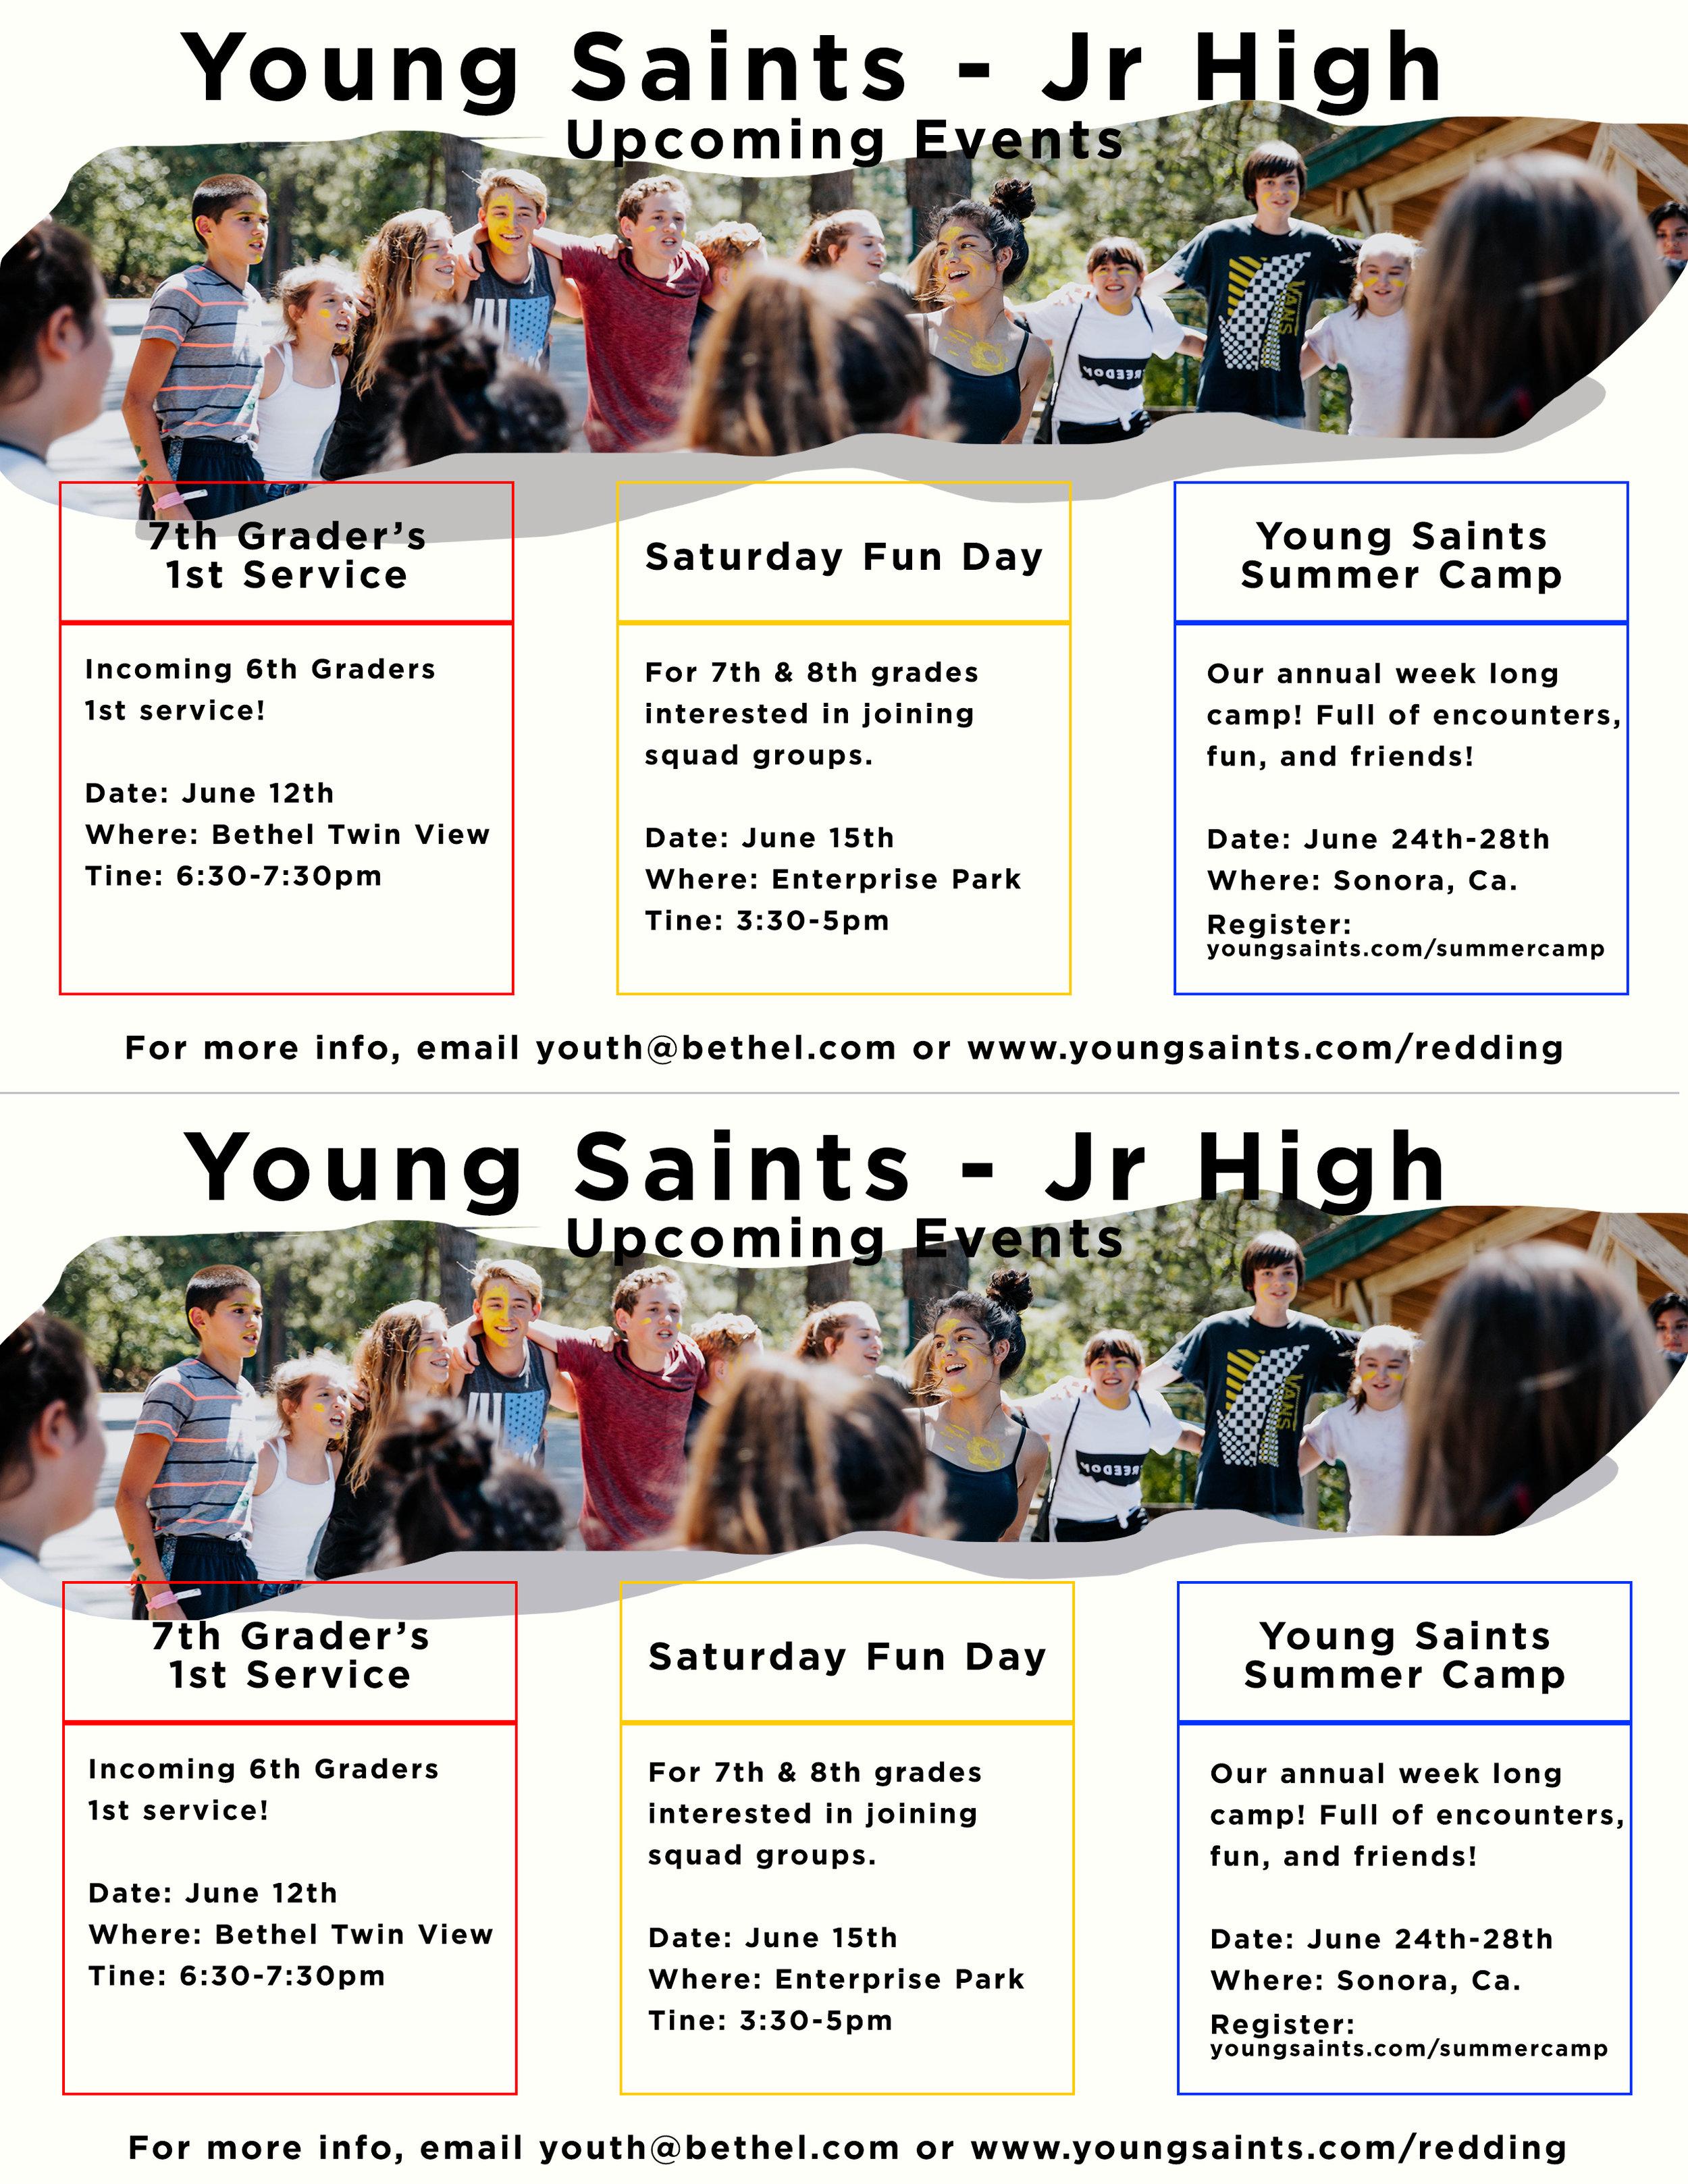 YS jr high events.jpg